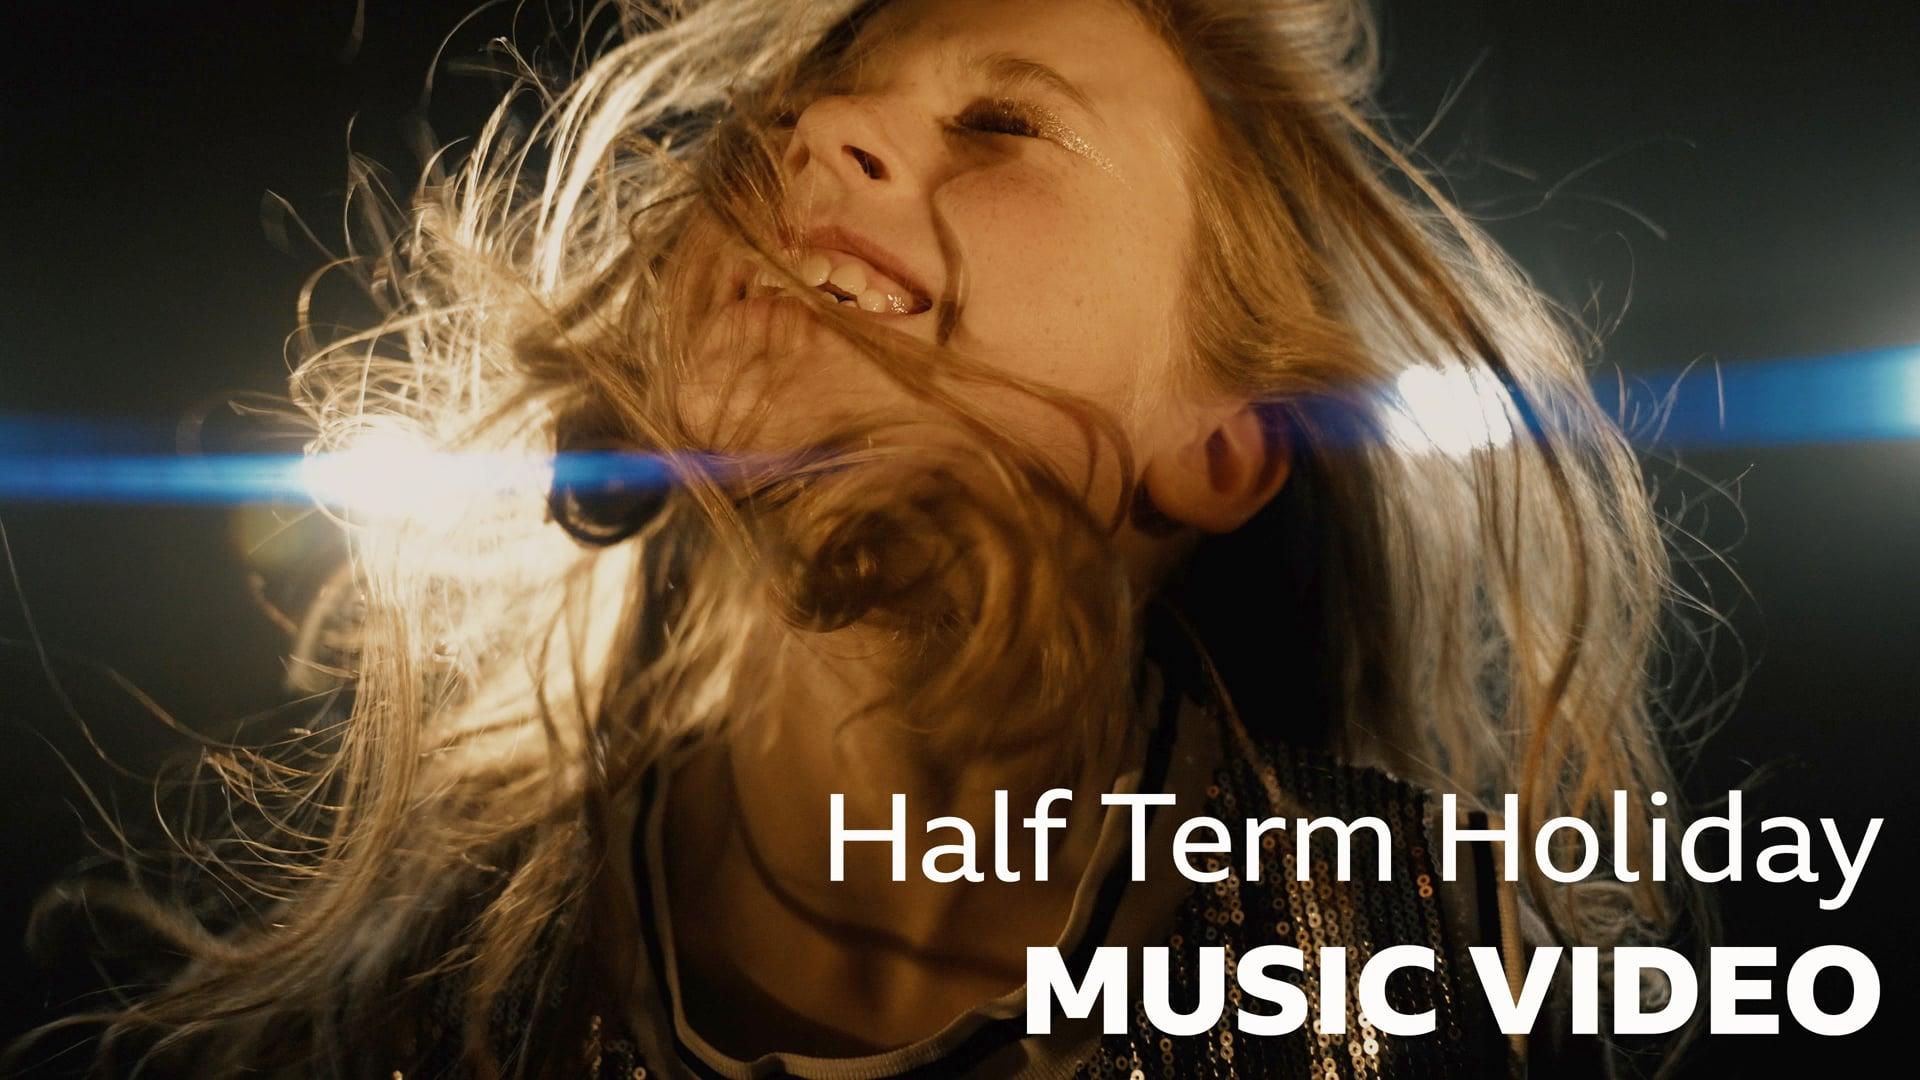 KratyKuts - Disco Sally - Half Term Holiday Music Video